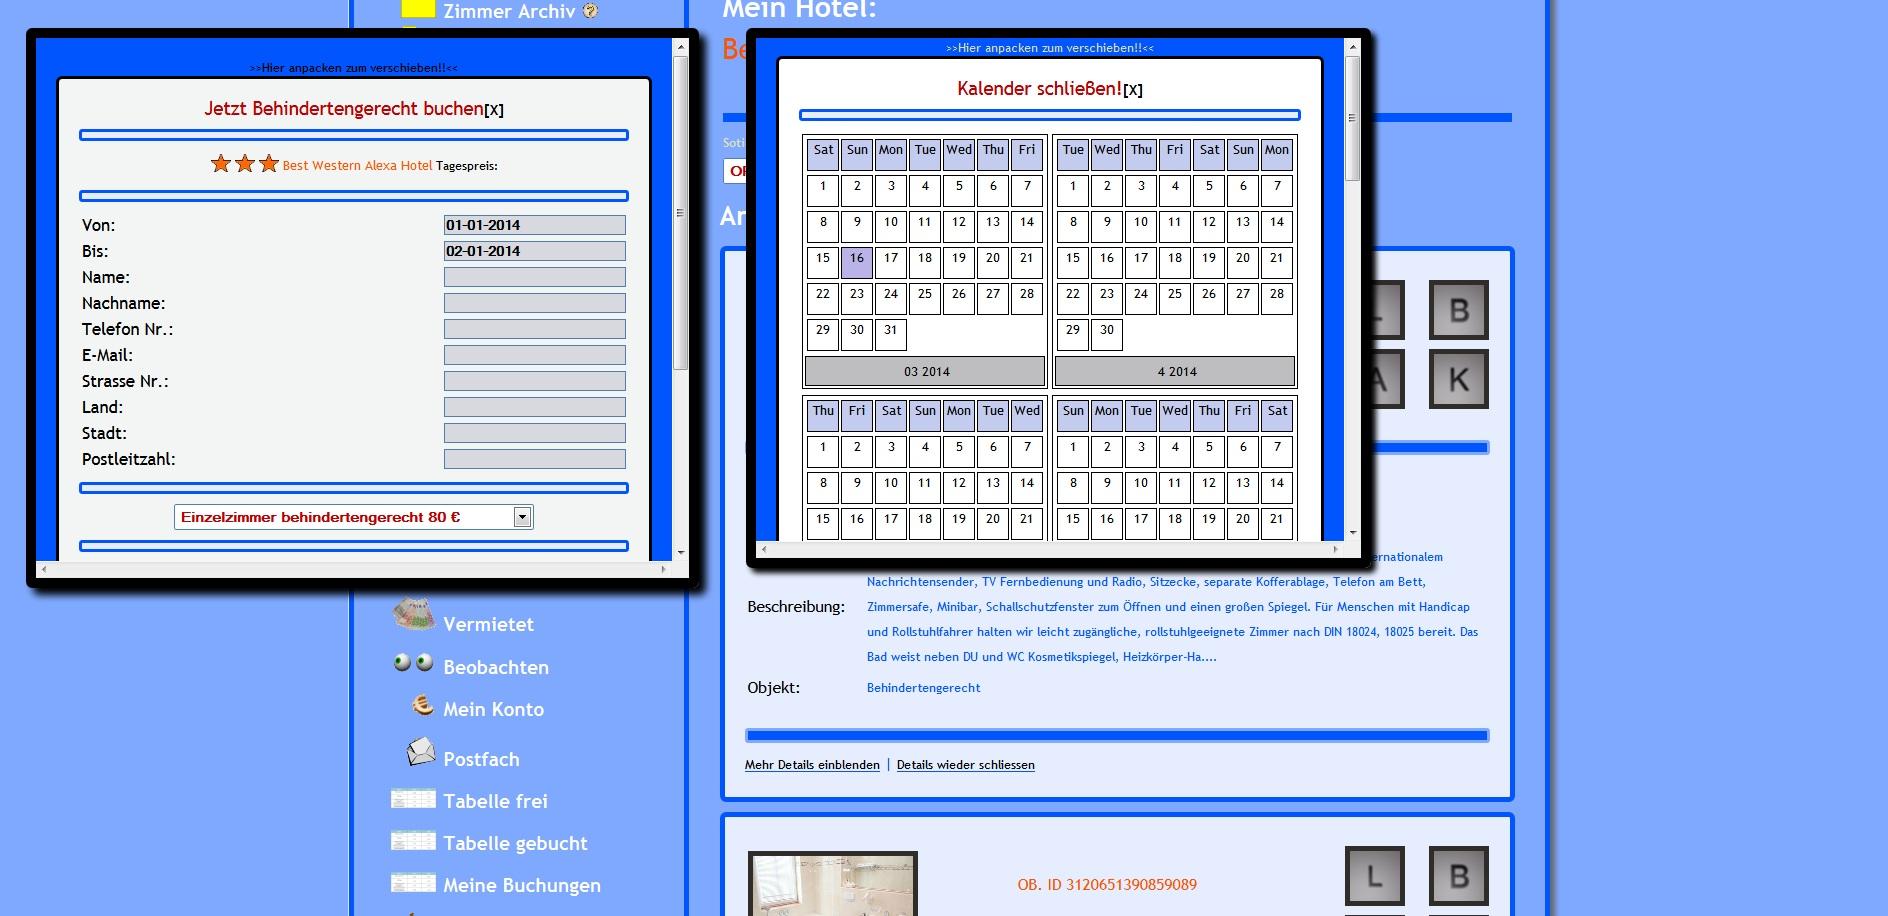 Hotelmanagementsoftware6